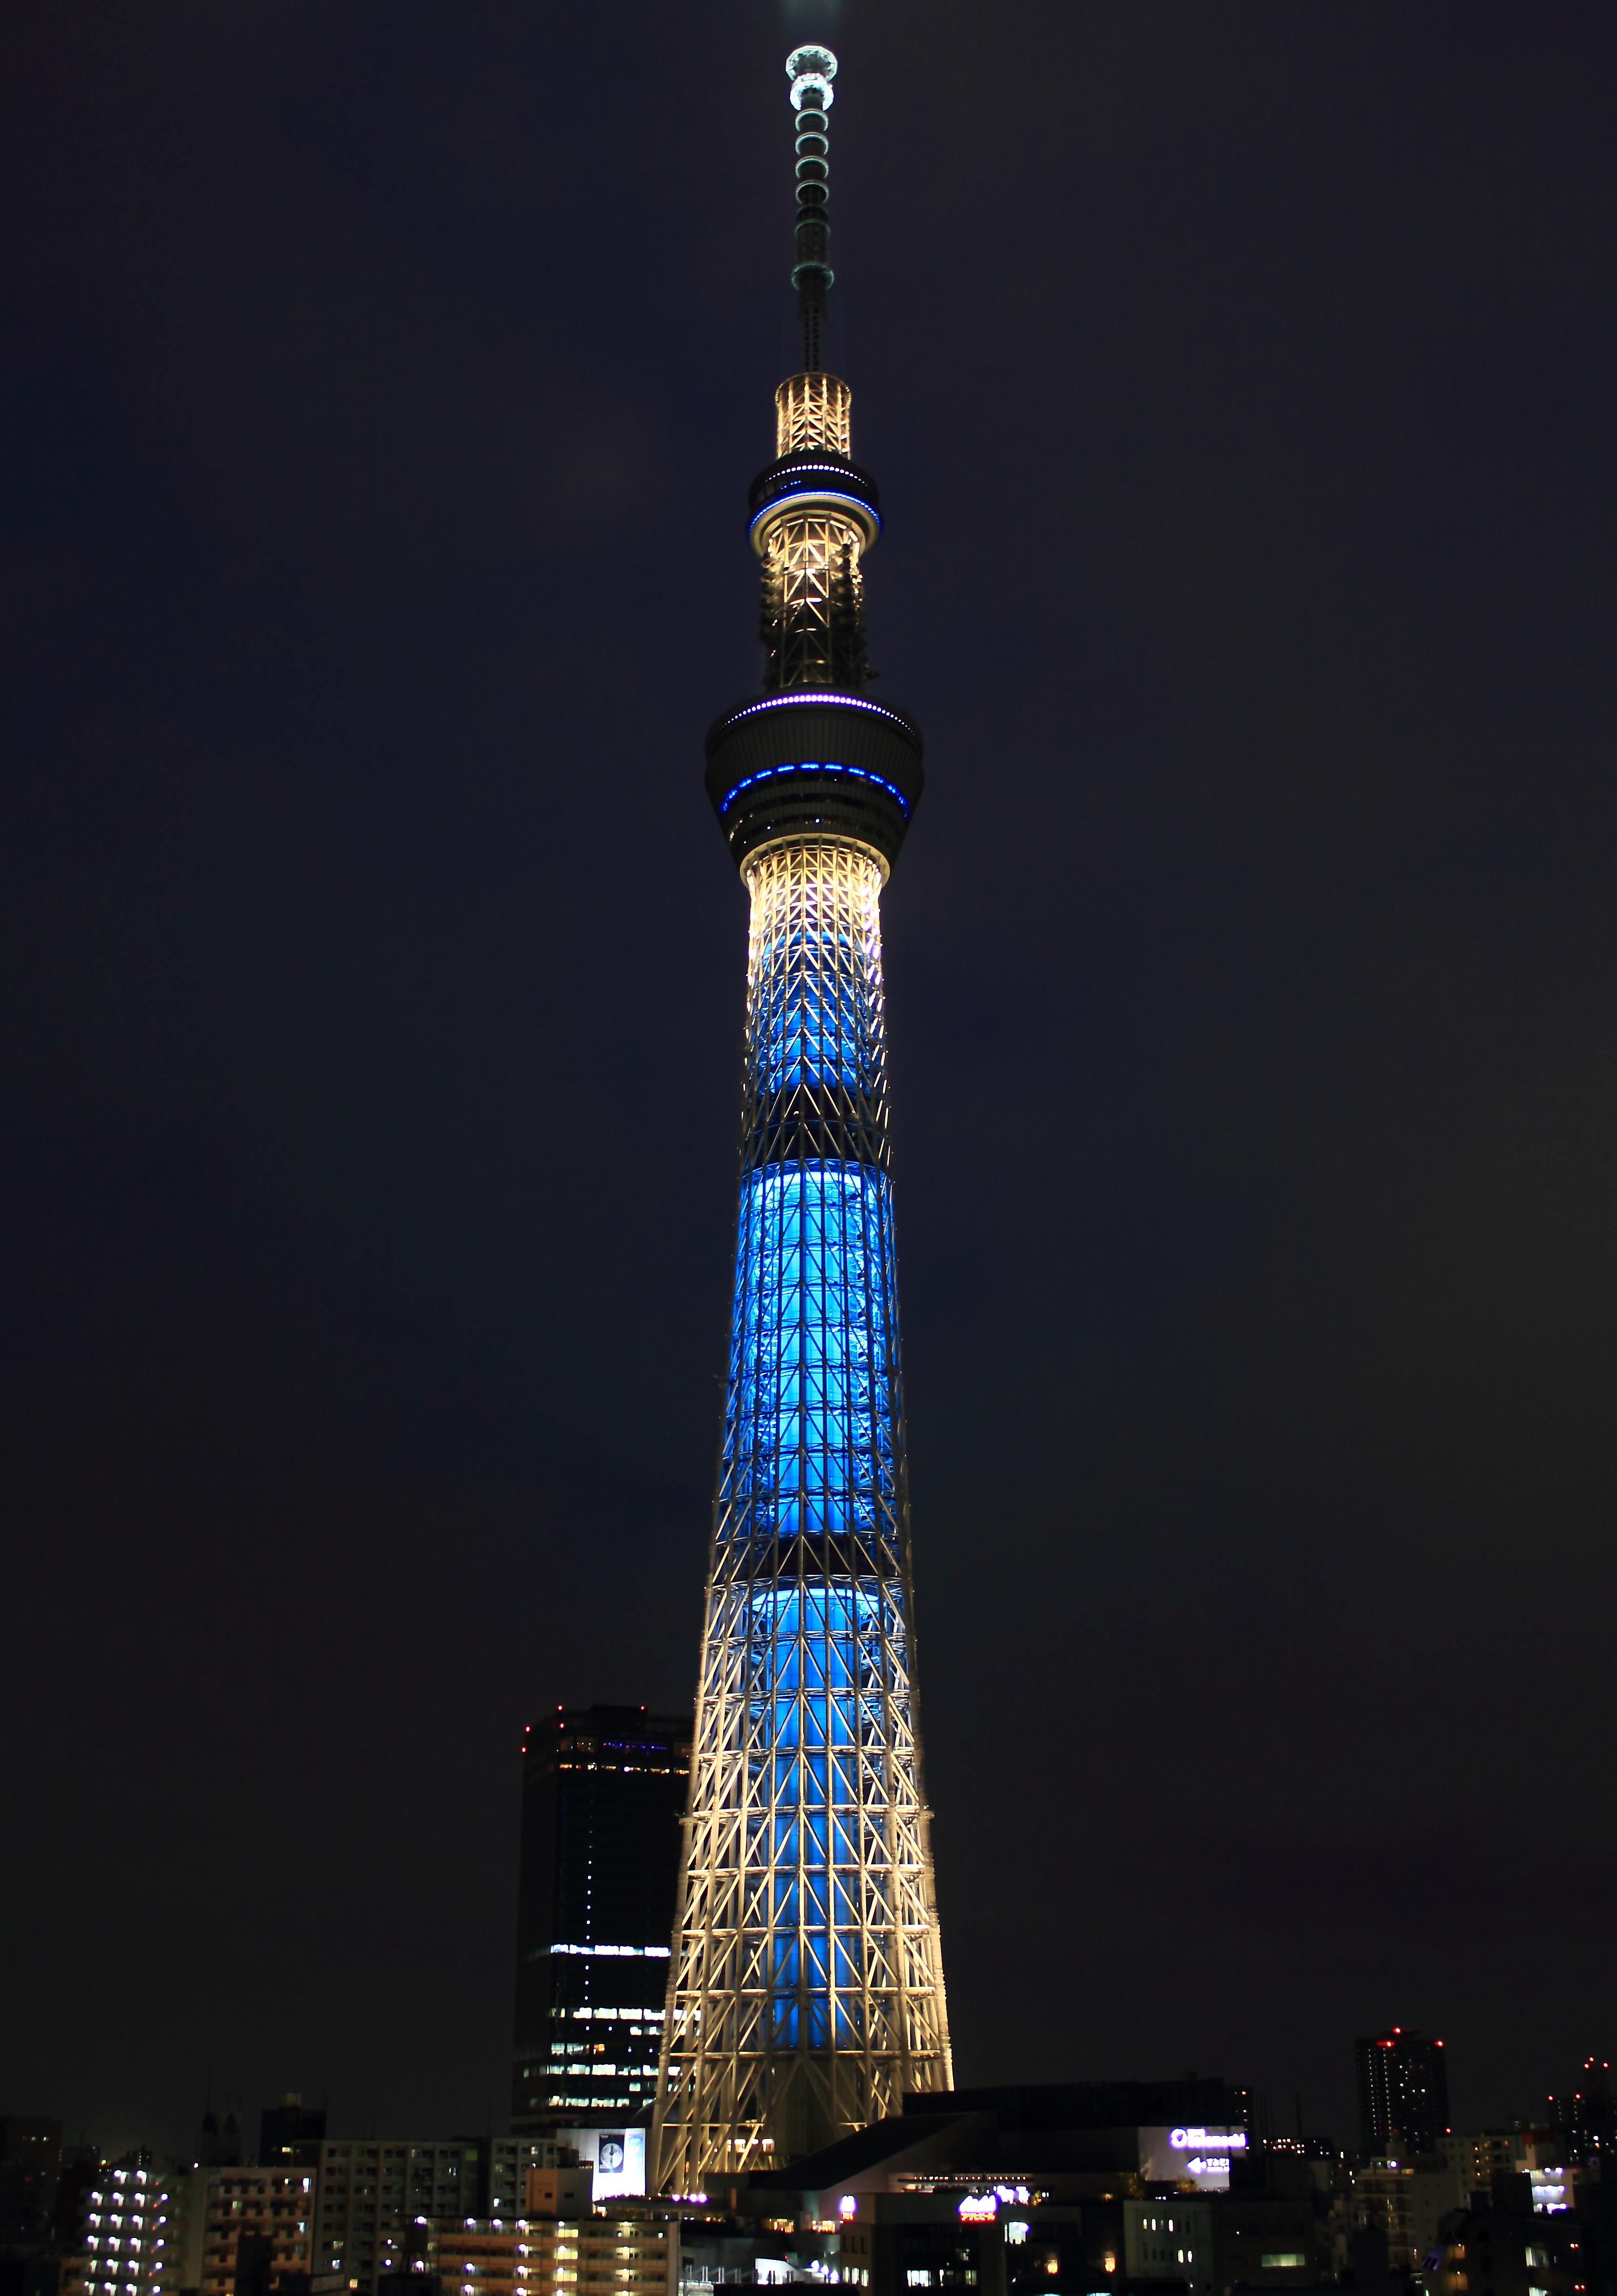 Tokyo_Sky_Tree_at_night_(Iki) (1)